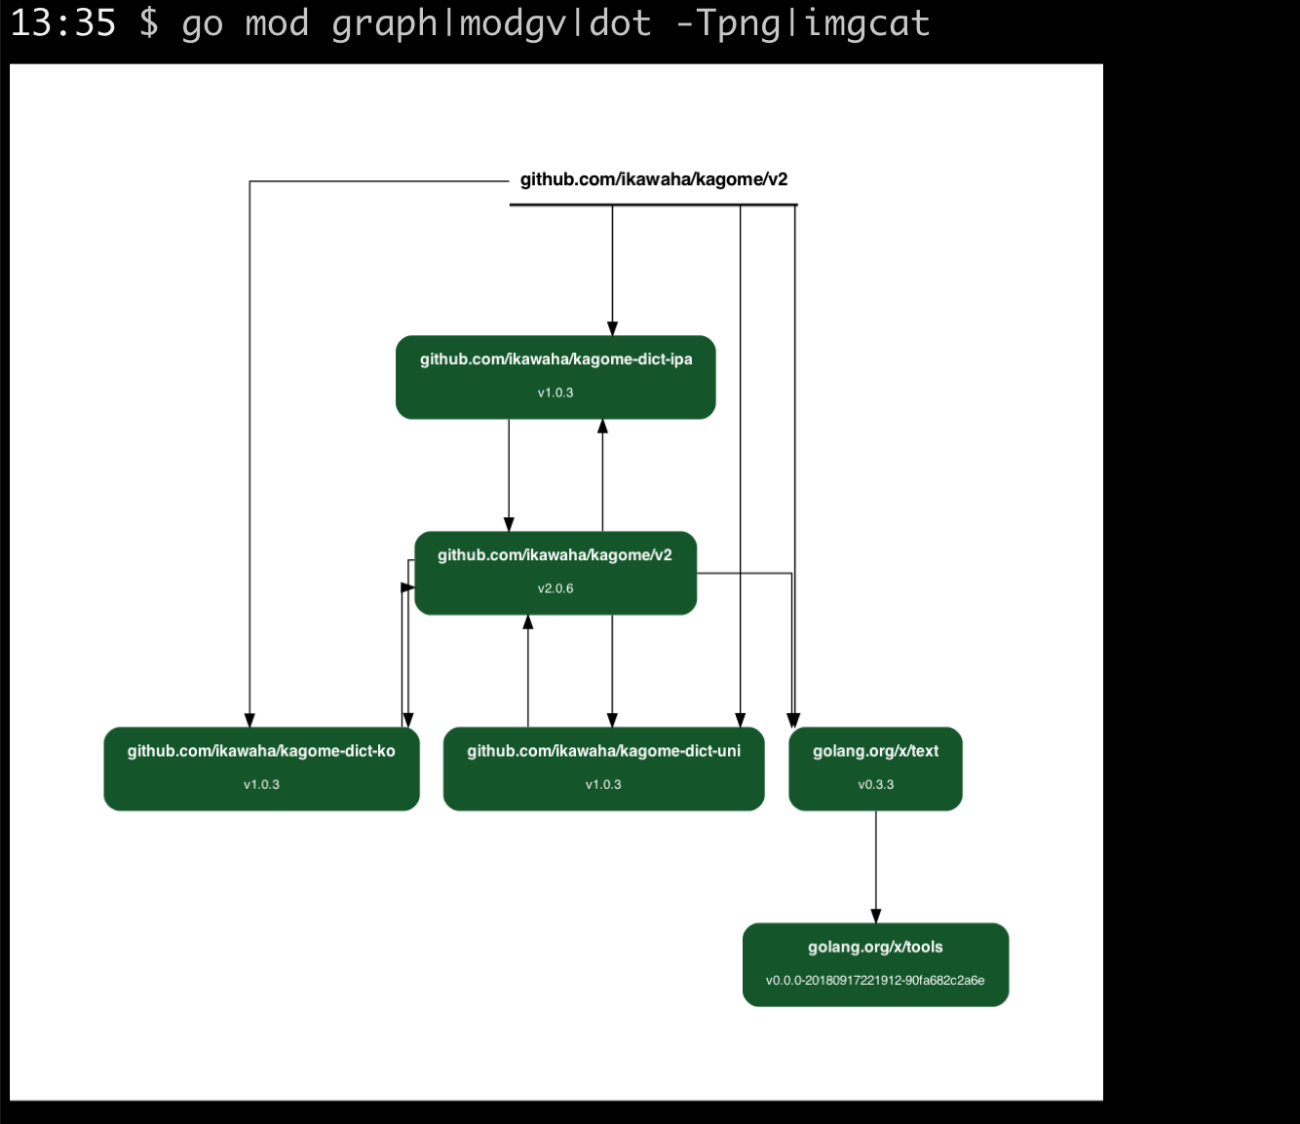 mod-graph